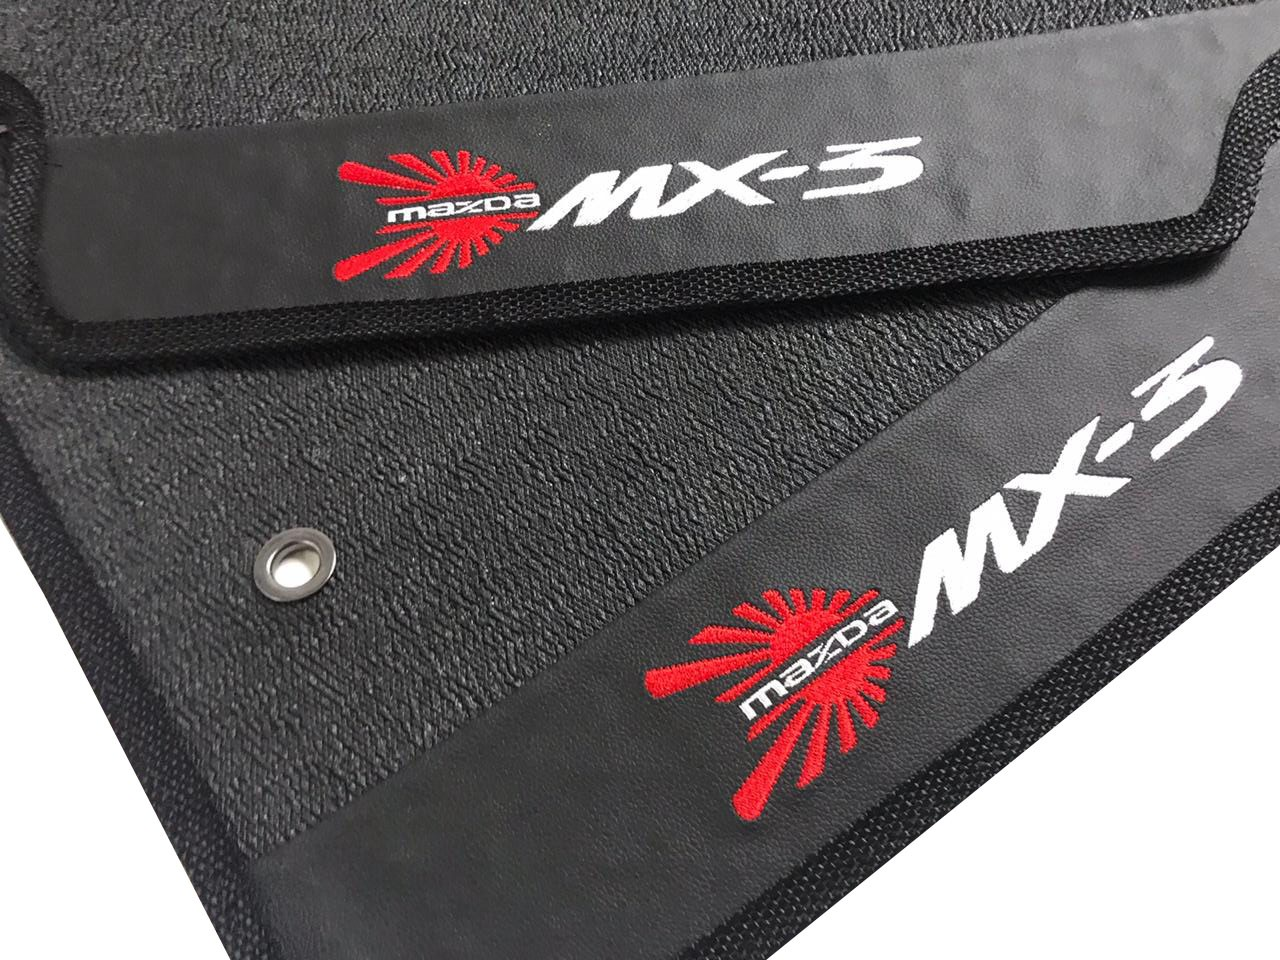 Tapete Mazda Mx-3 Borracha Pvc Base Pinada